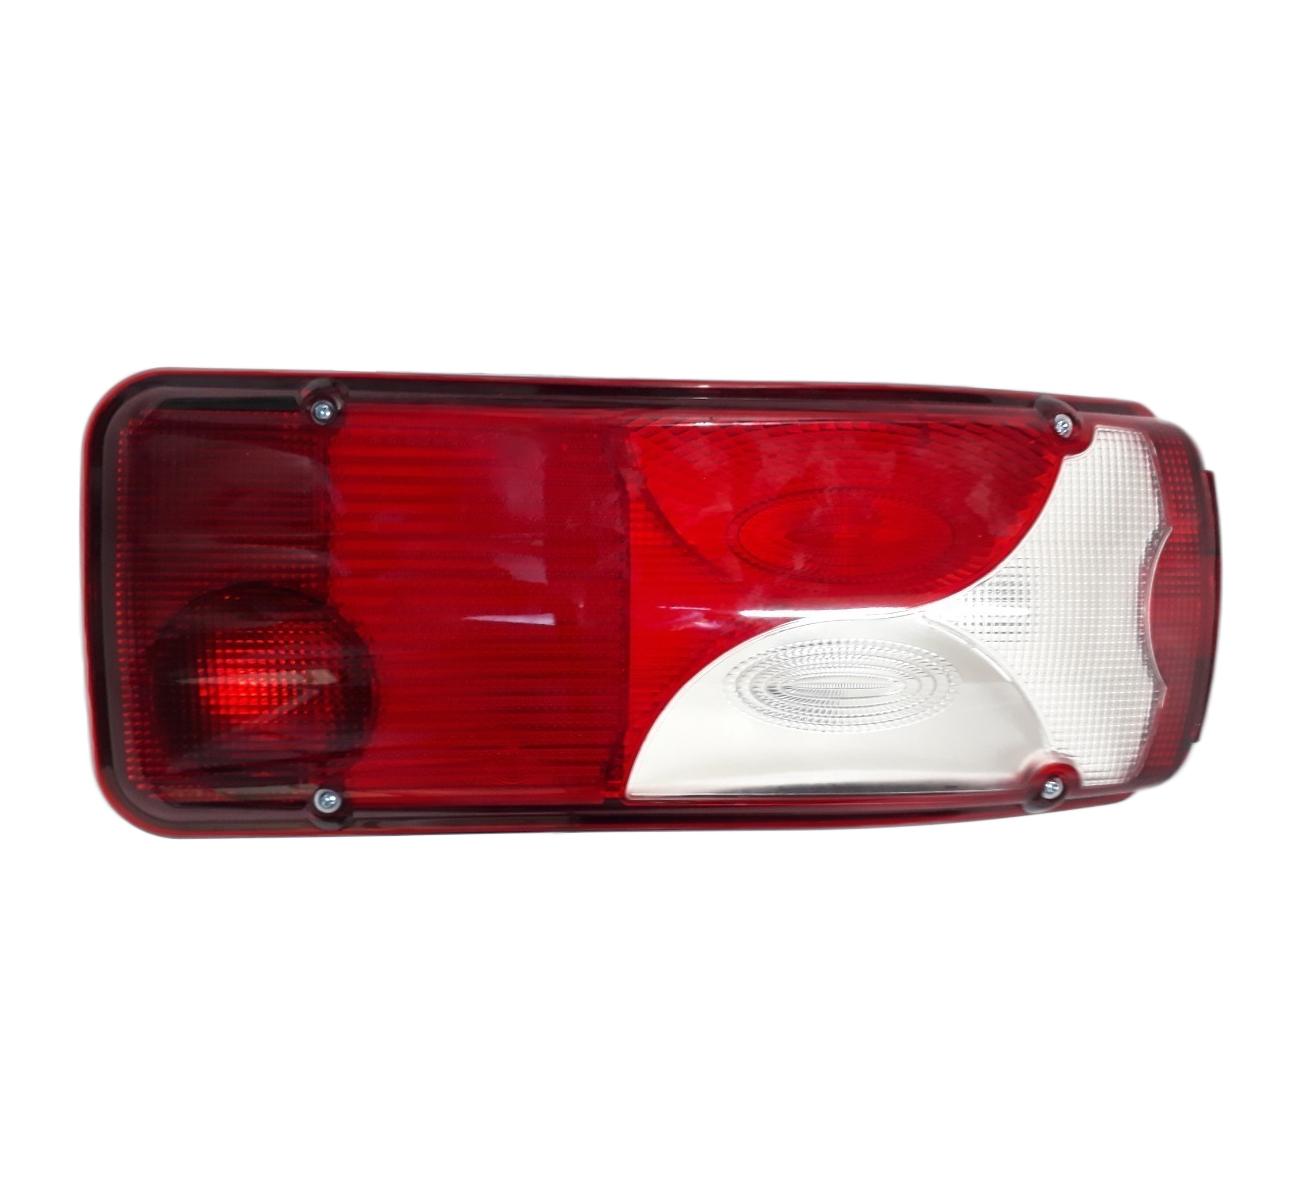 Lanterna Traseira Volvo Vm Fh Fm